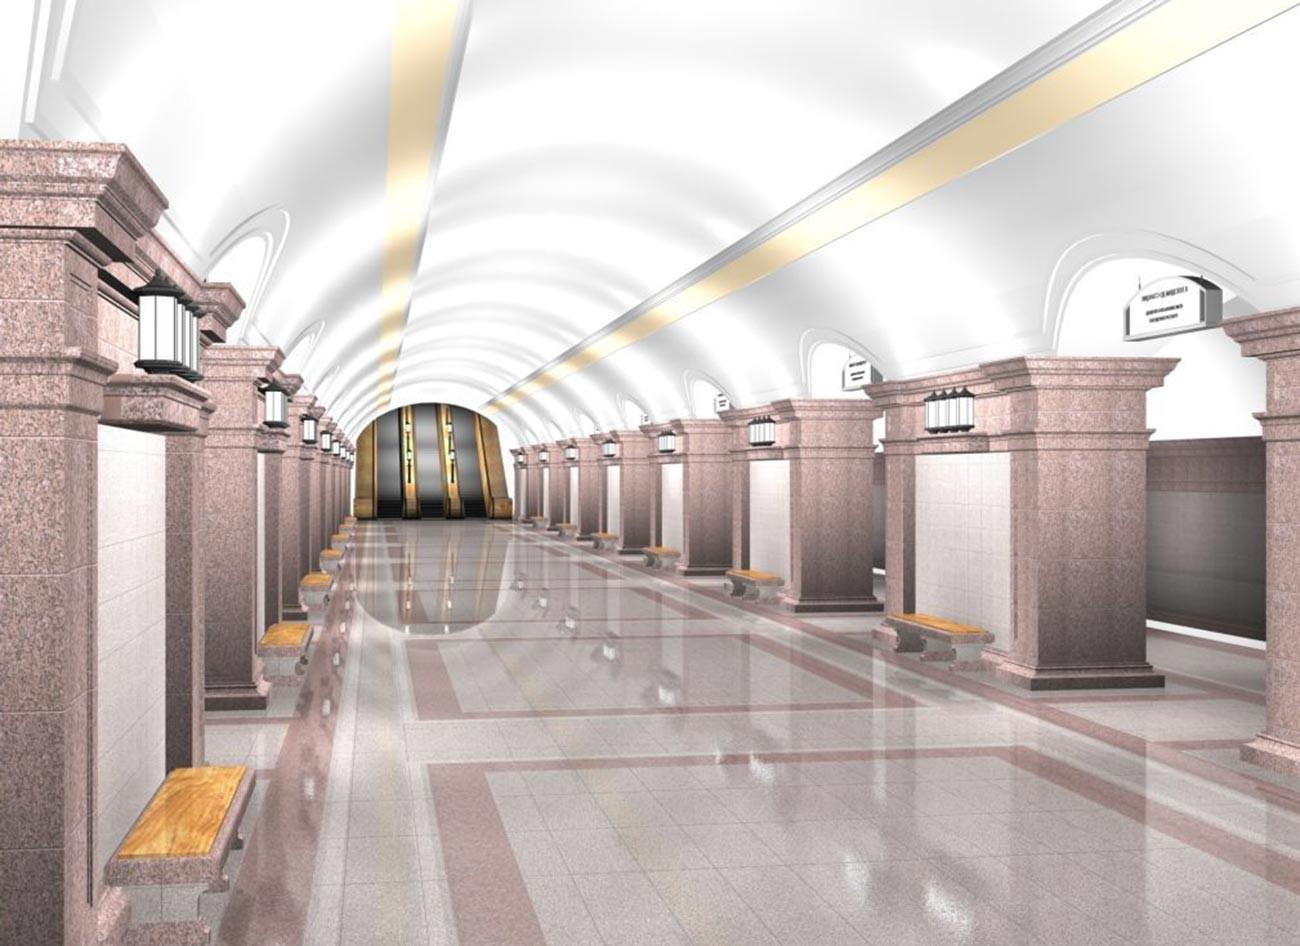 Metrô em Tcheliábinsk.